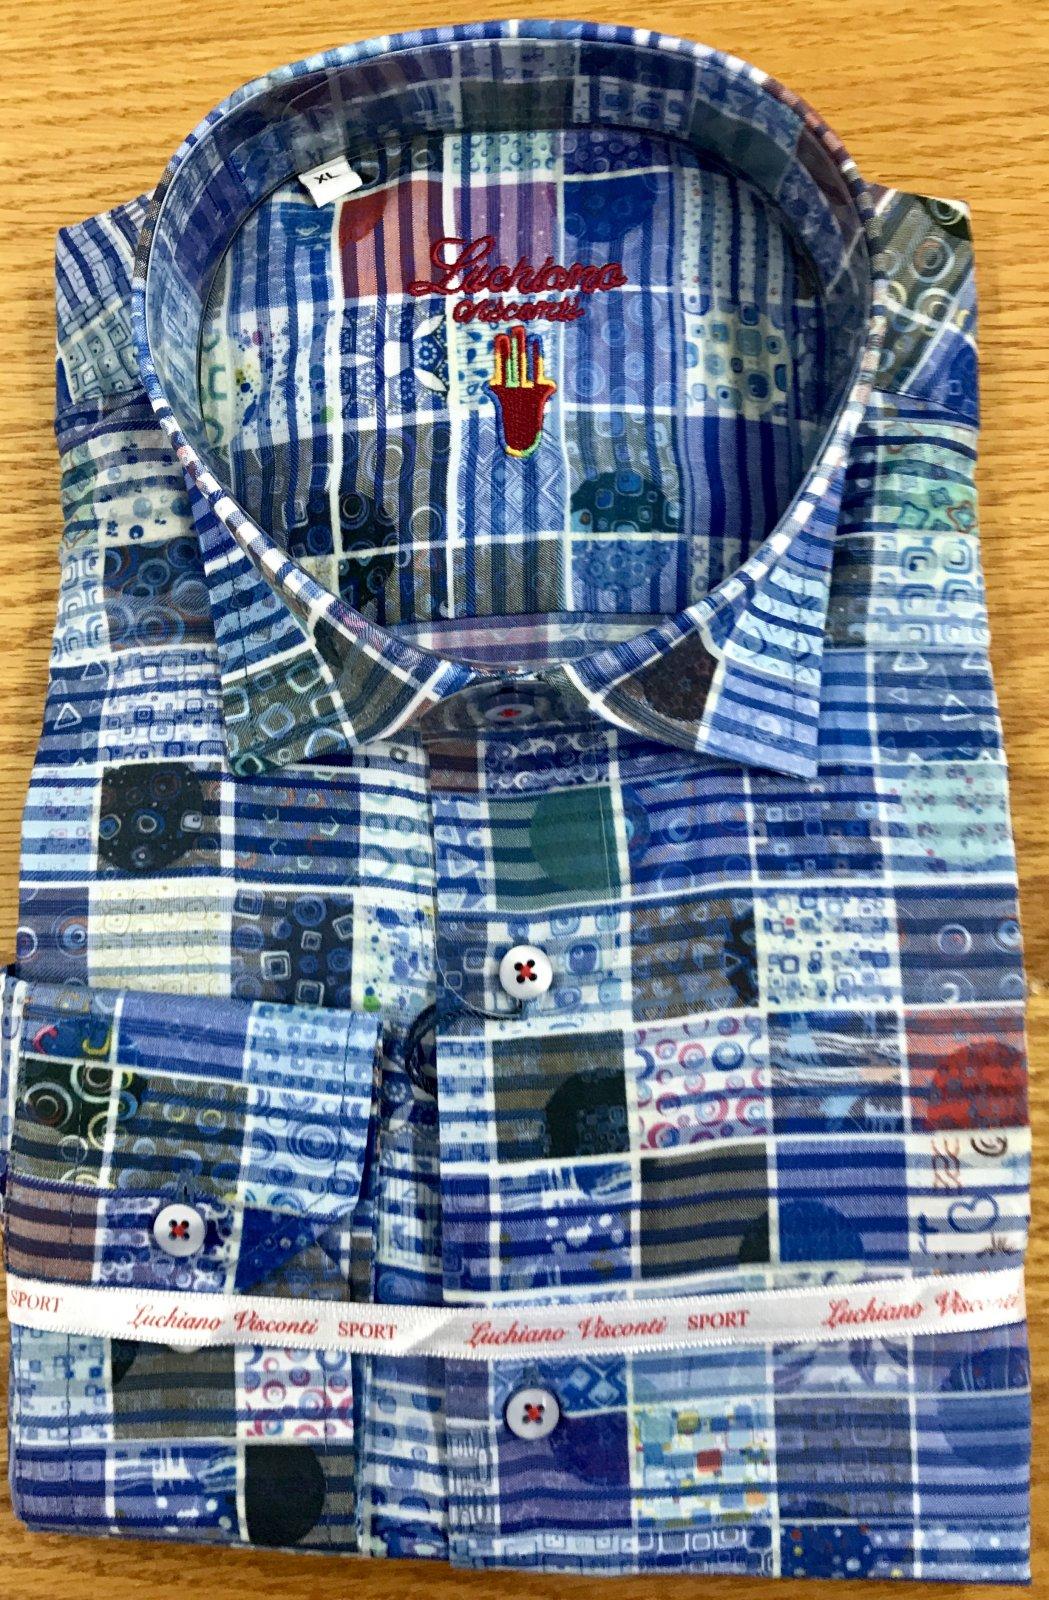 Luchiano Visconti LS Sportshirt 3966